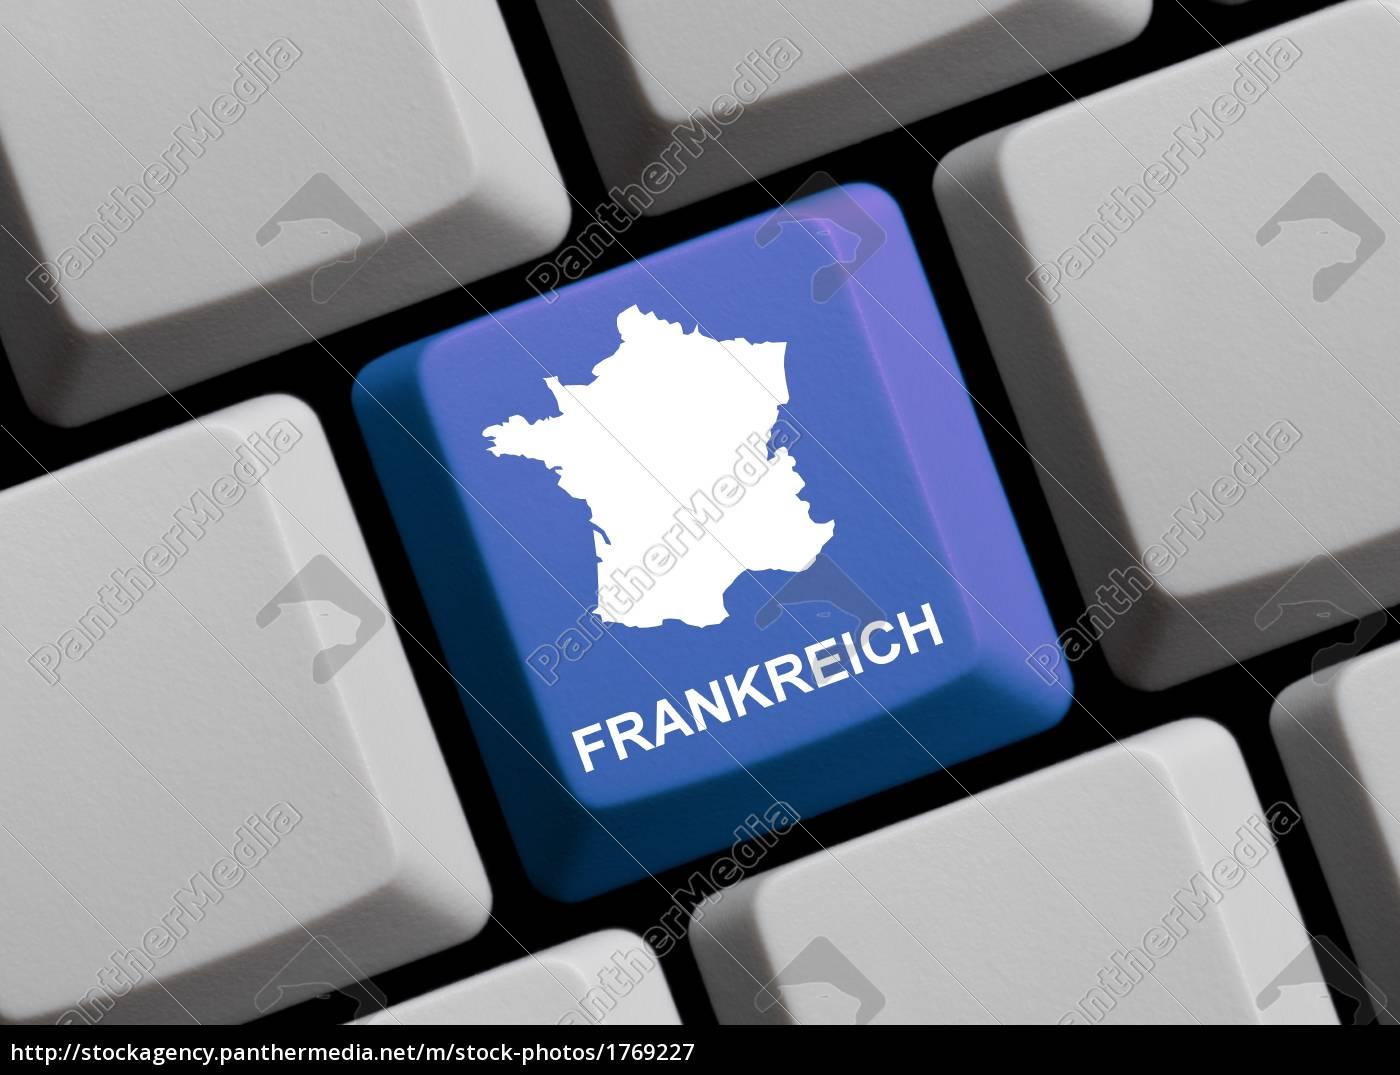 france, -, map, on, keyboard - 1769227